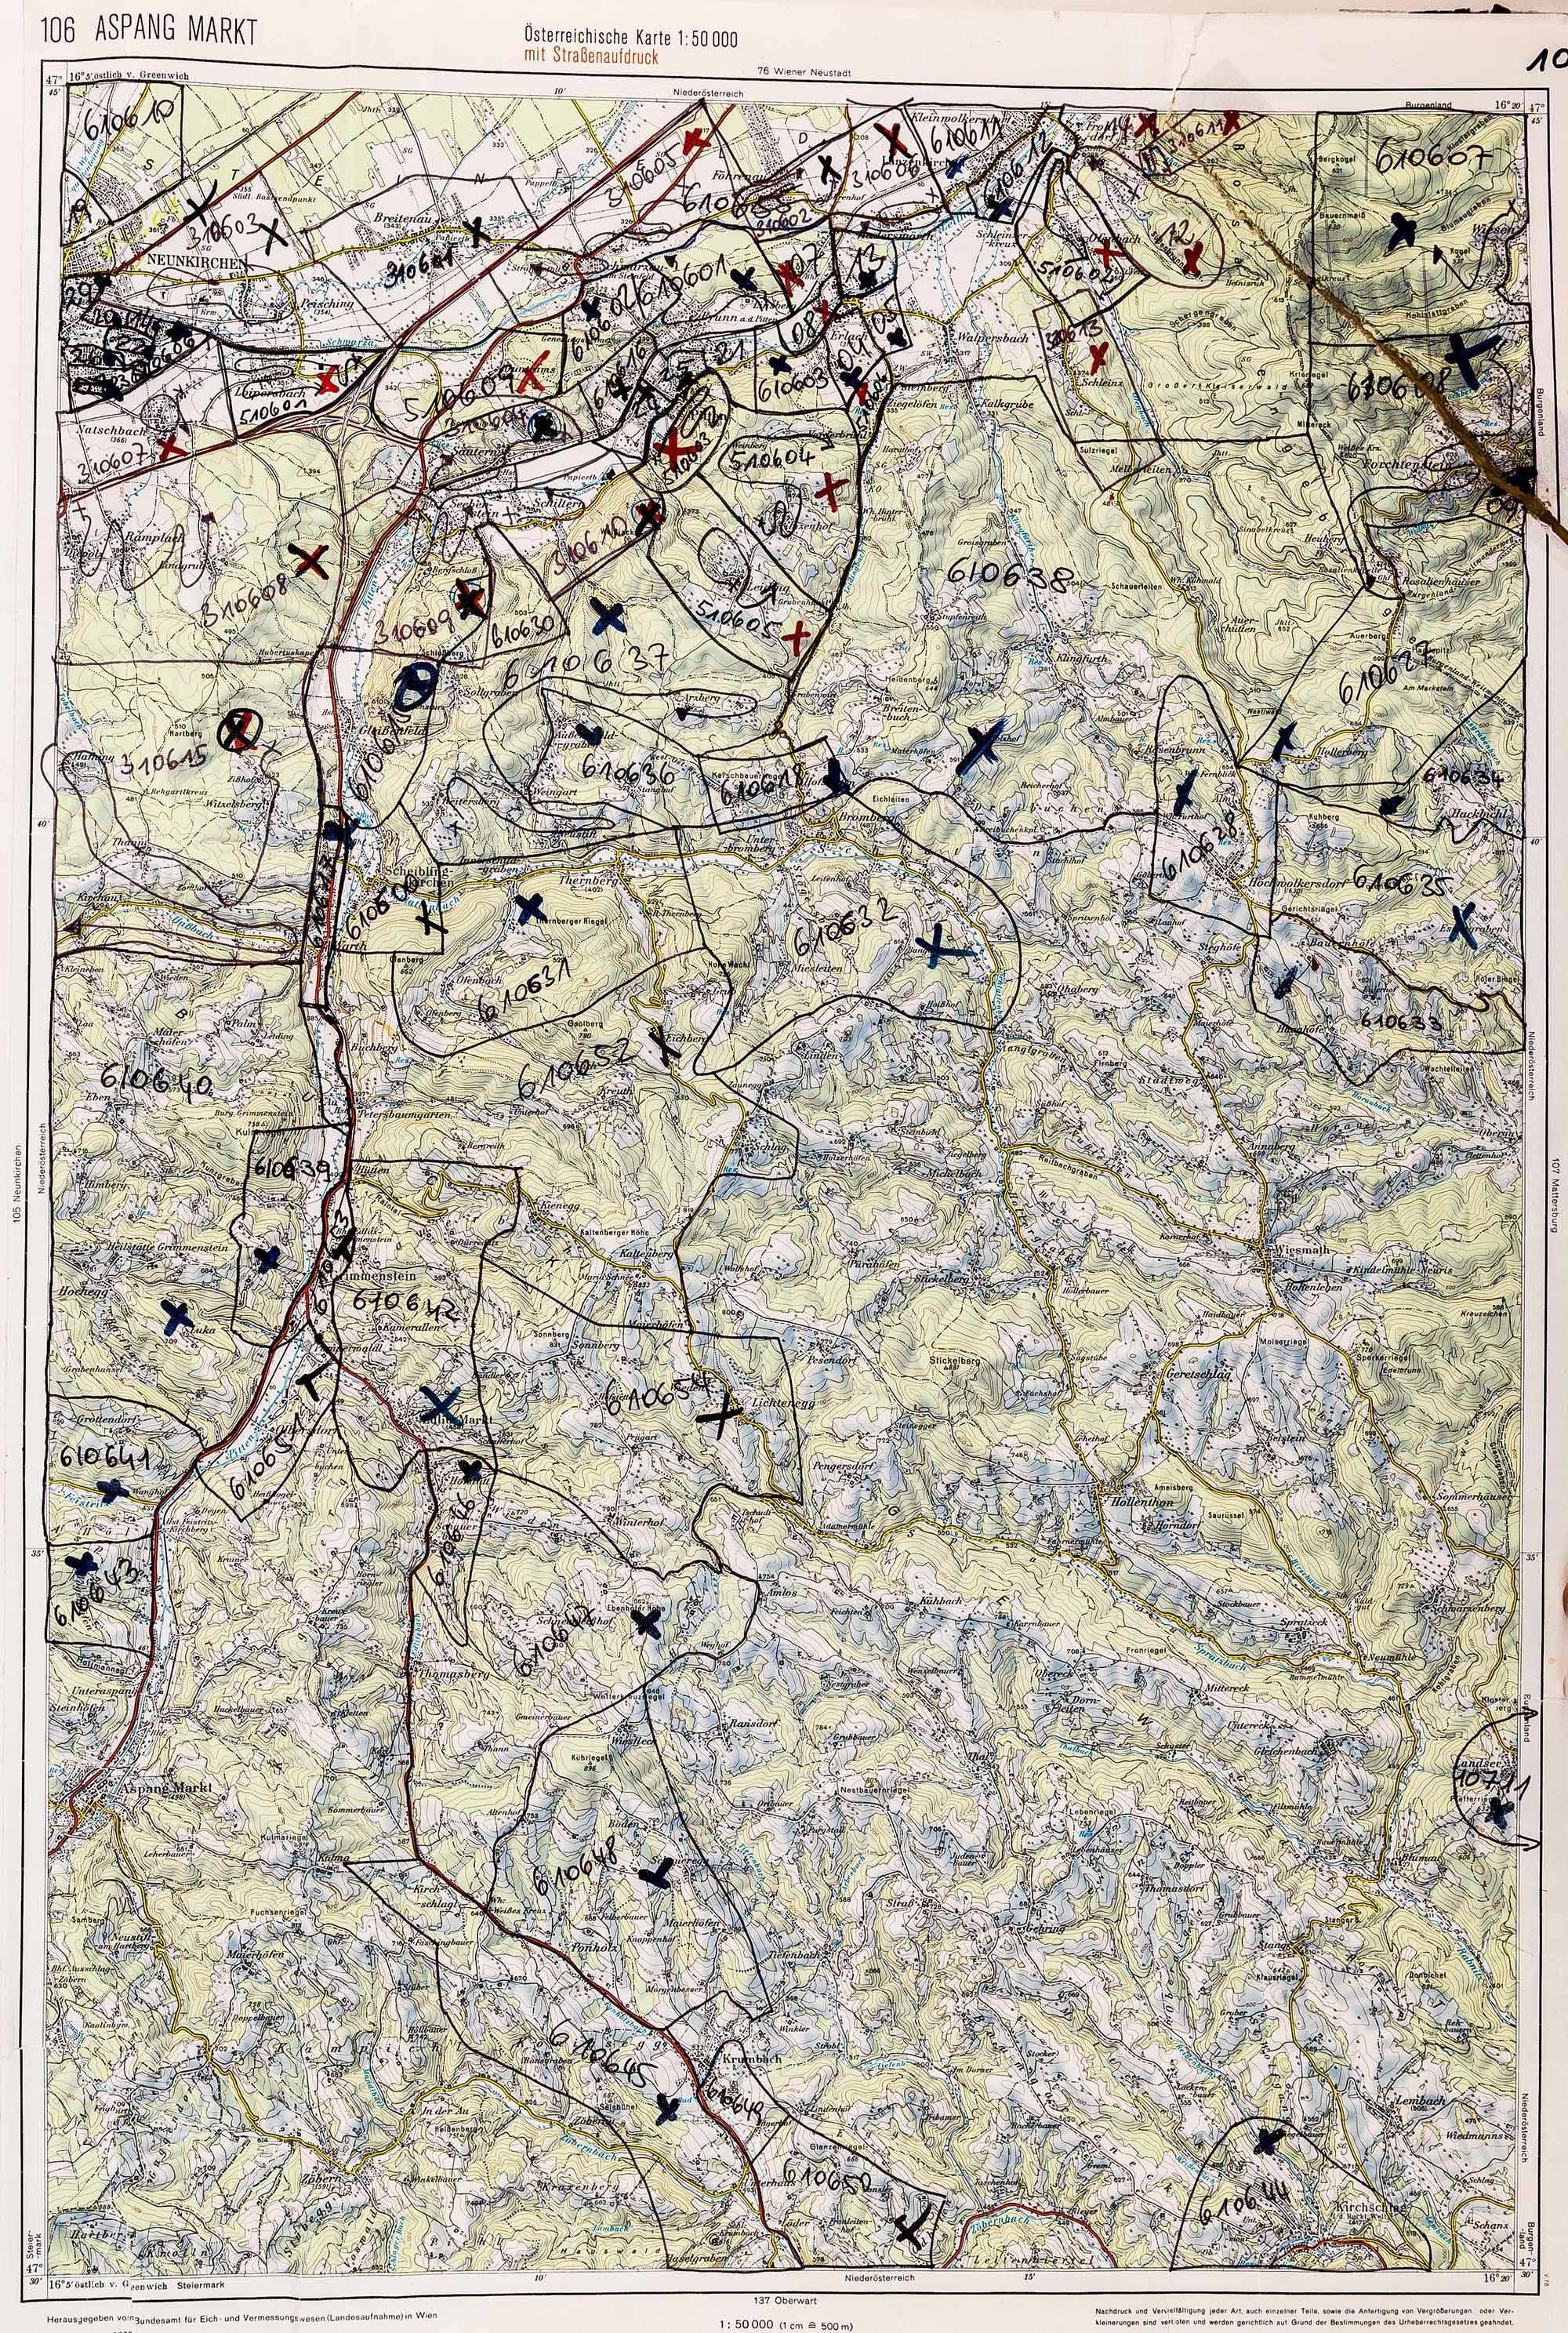 1983-1986 Karte 106